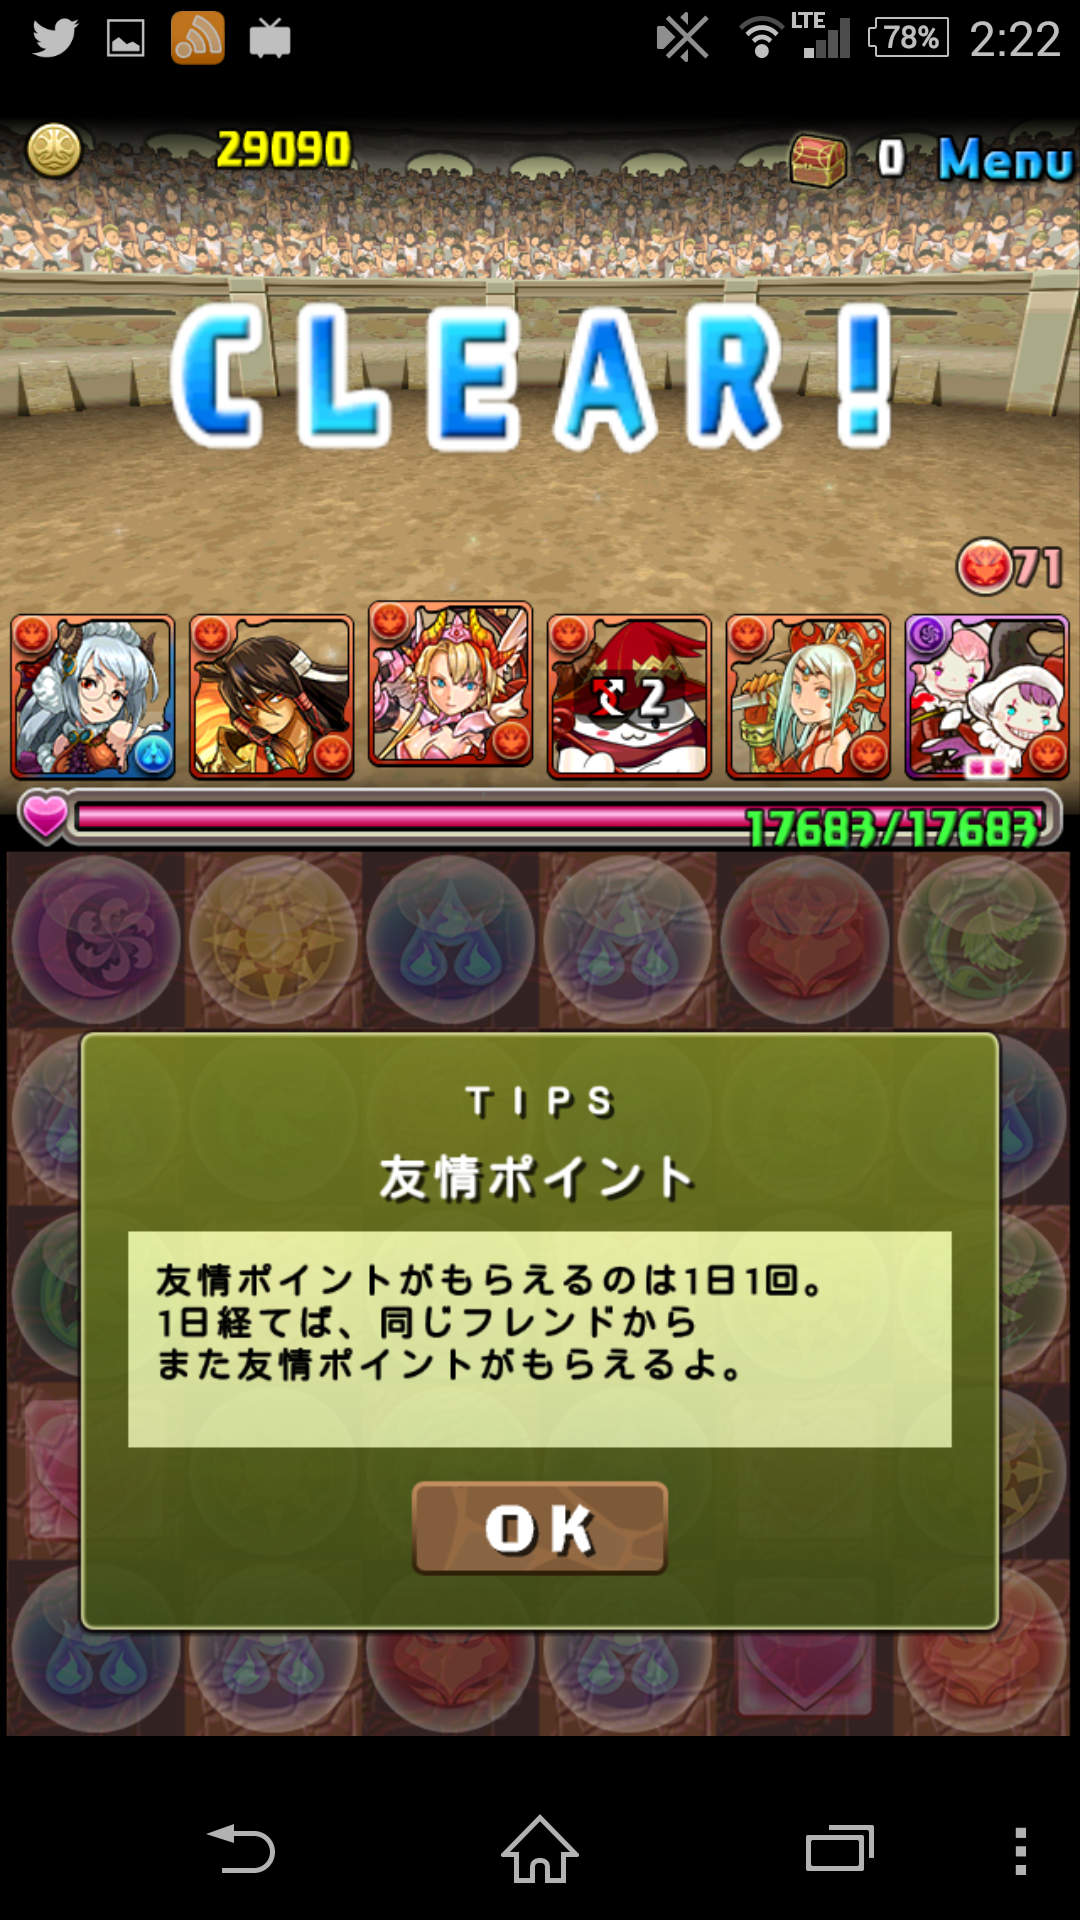 Screenshot_2015-03-12-02-22-02.png